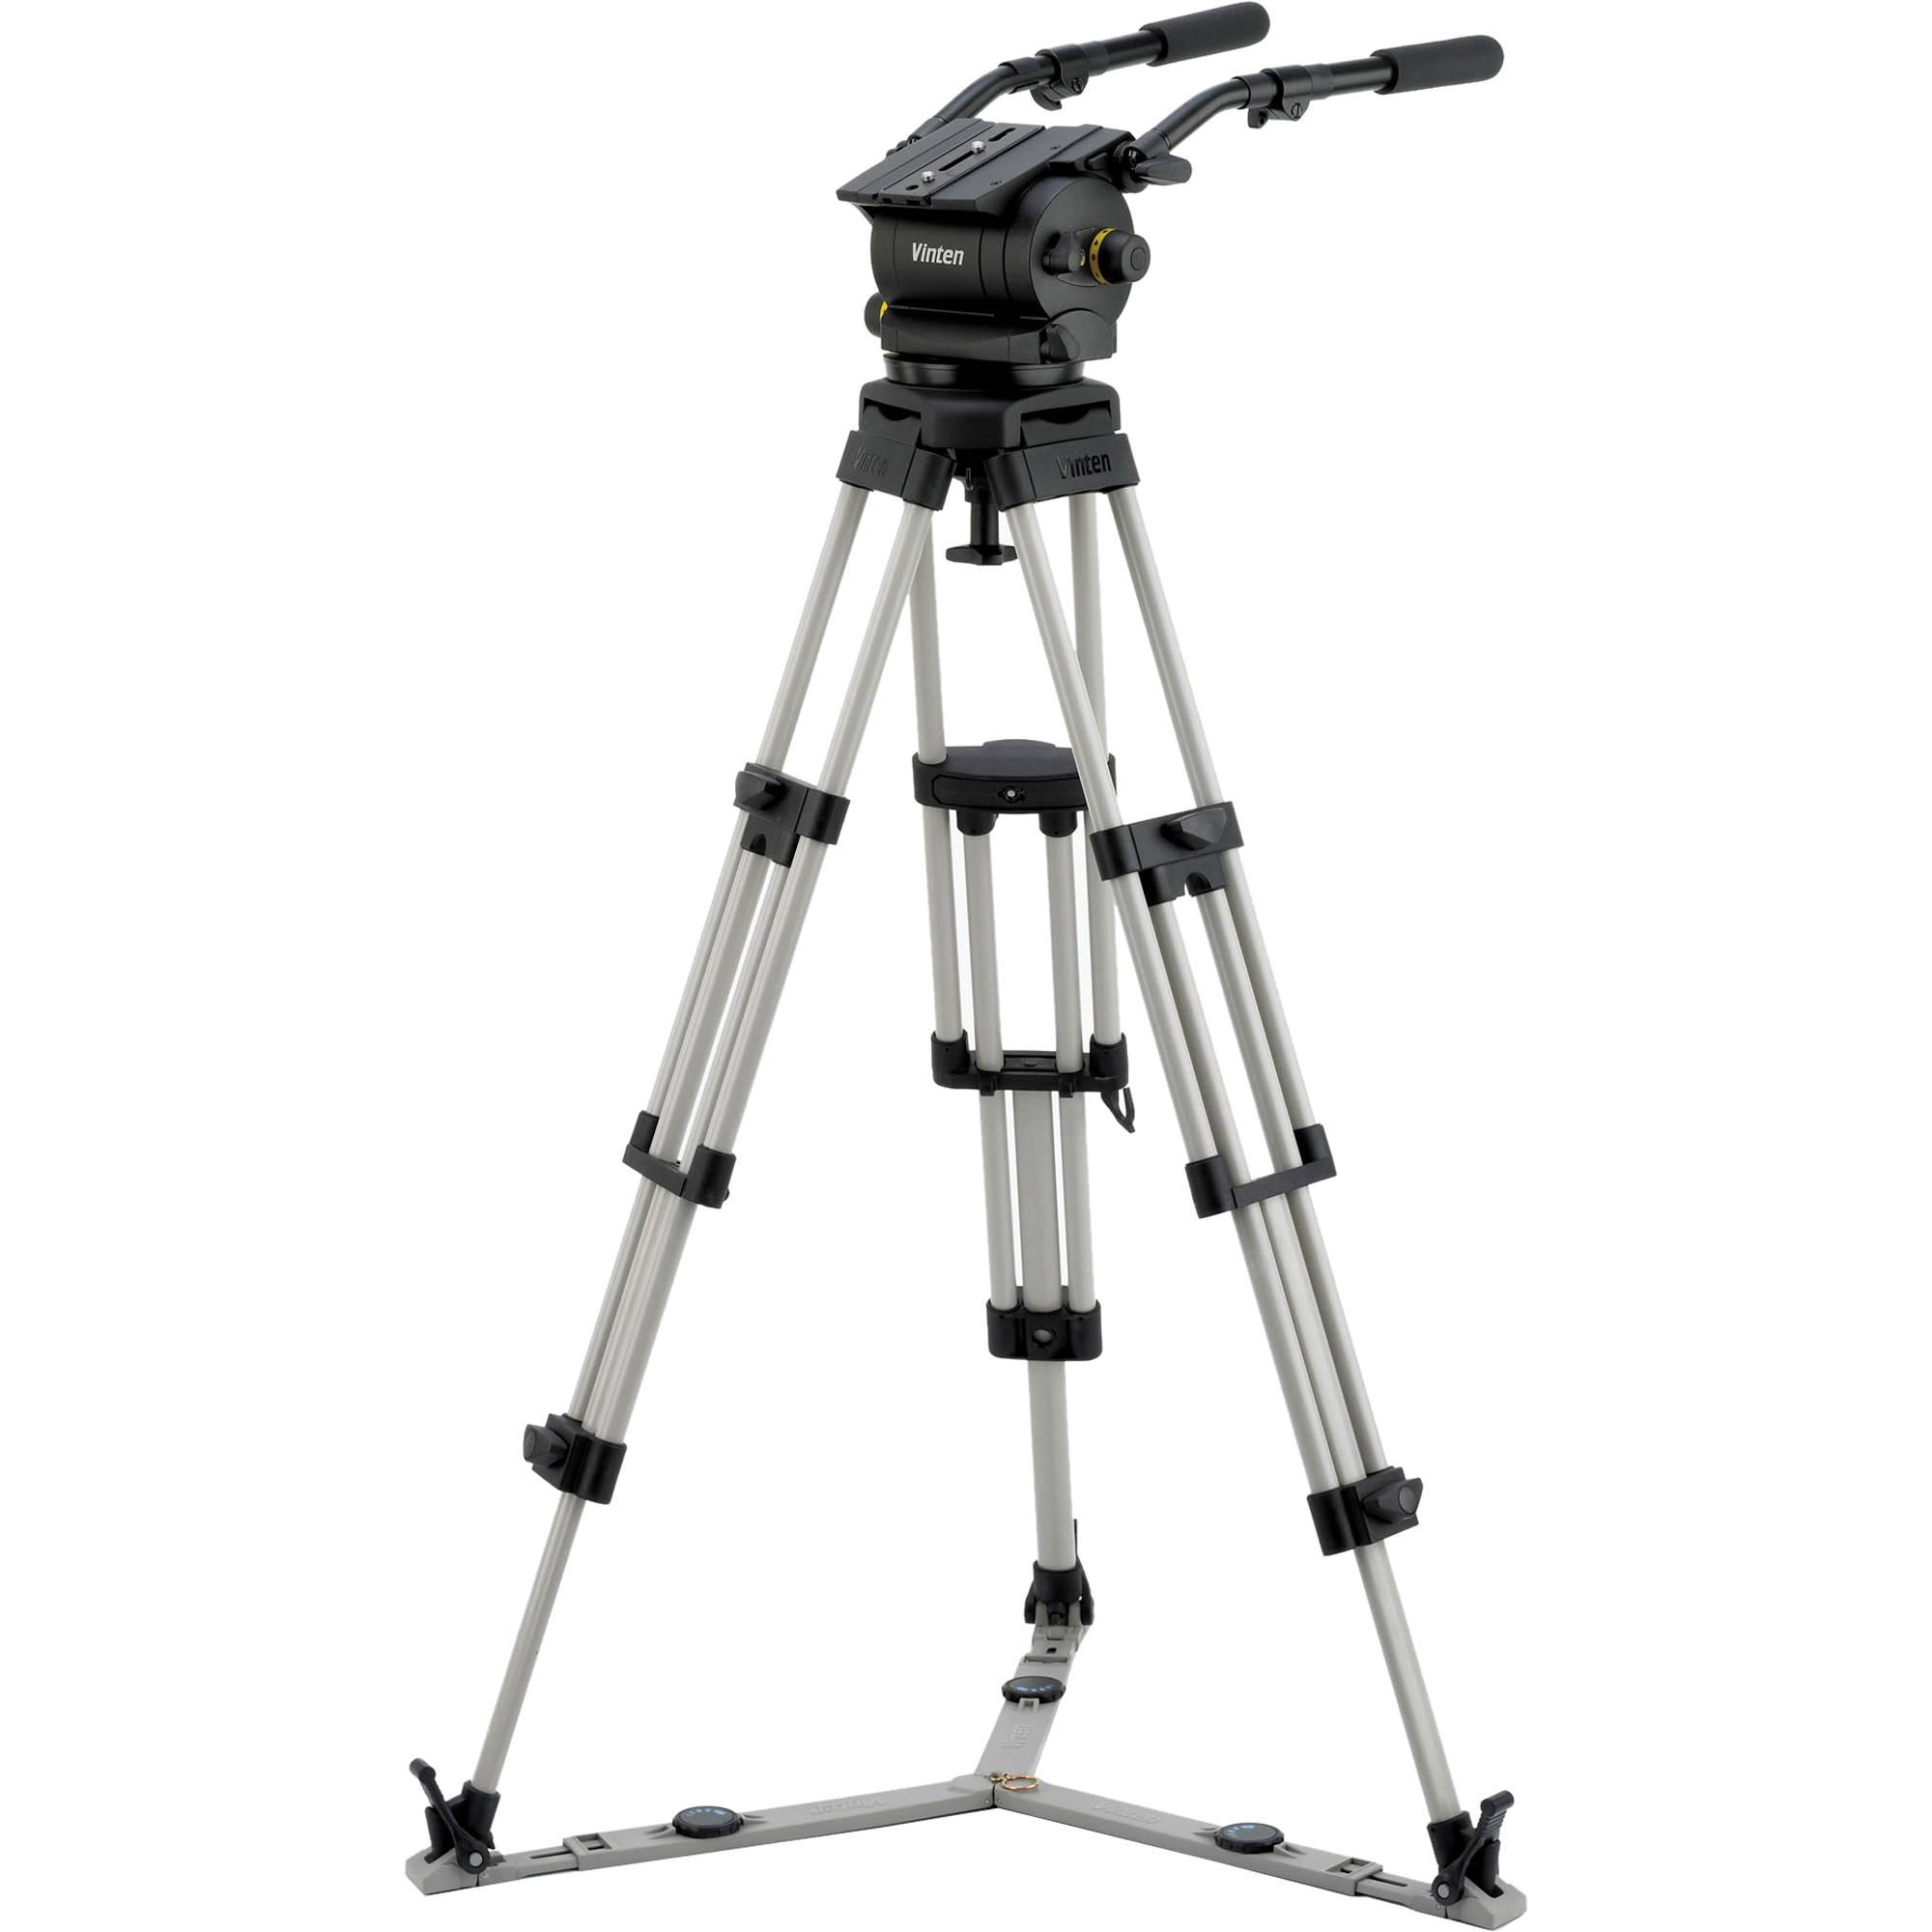 Vinten VB250-AP2 Vision 250 System VB250-AP2 B&H Photo Video